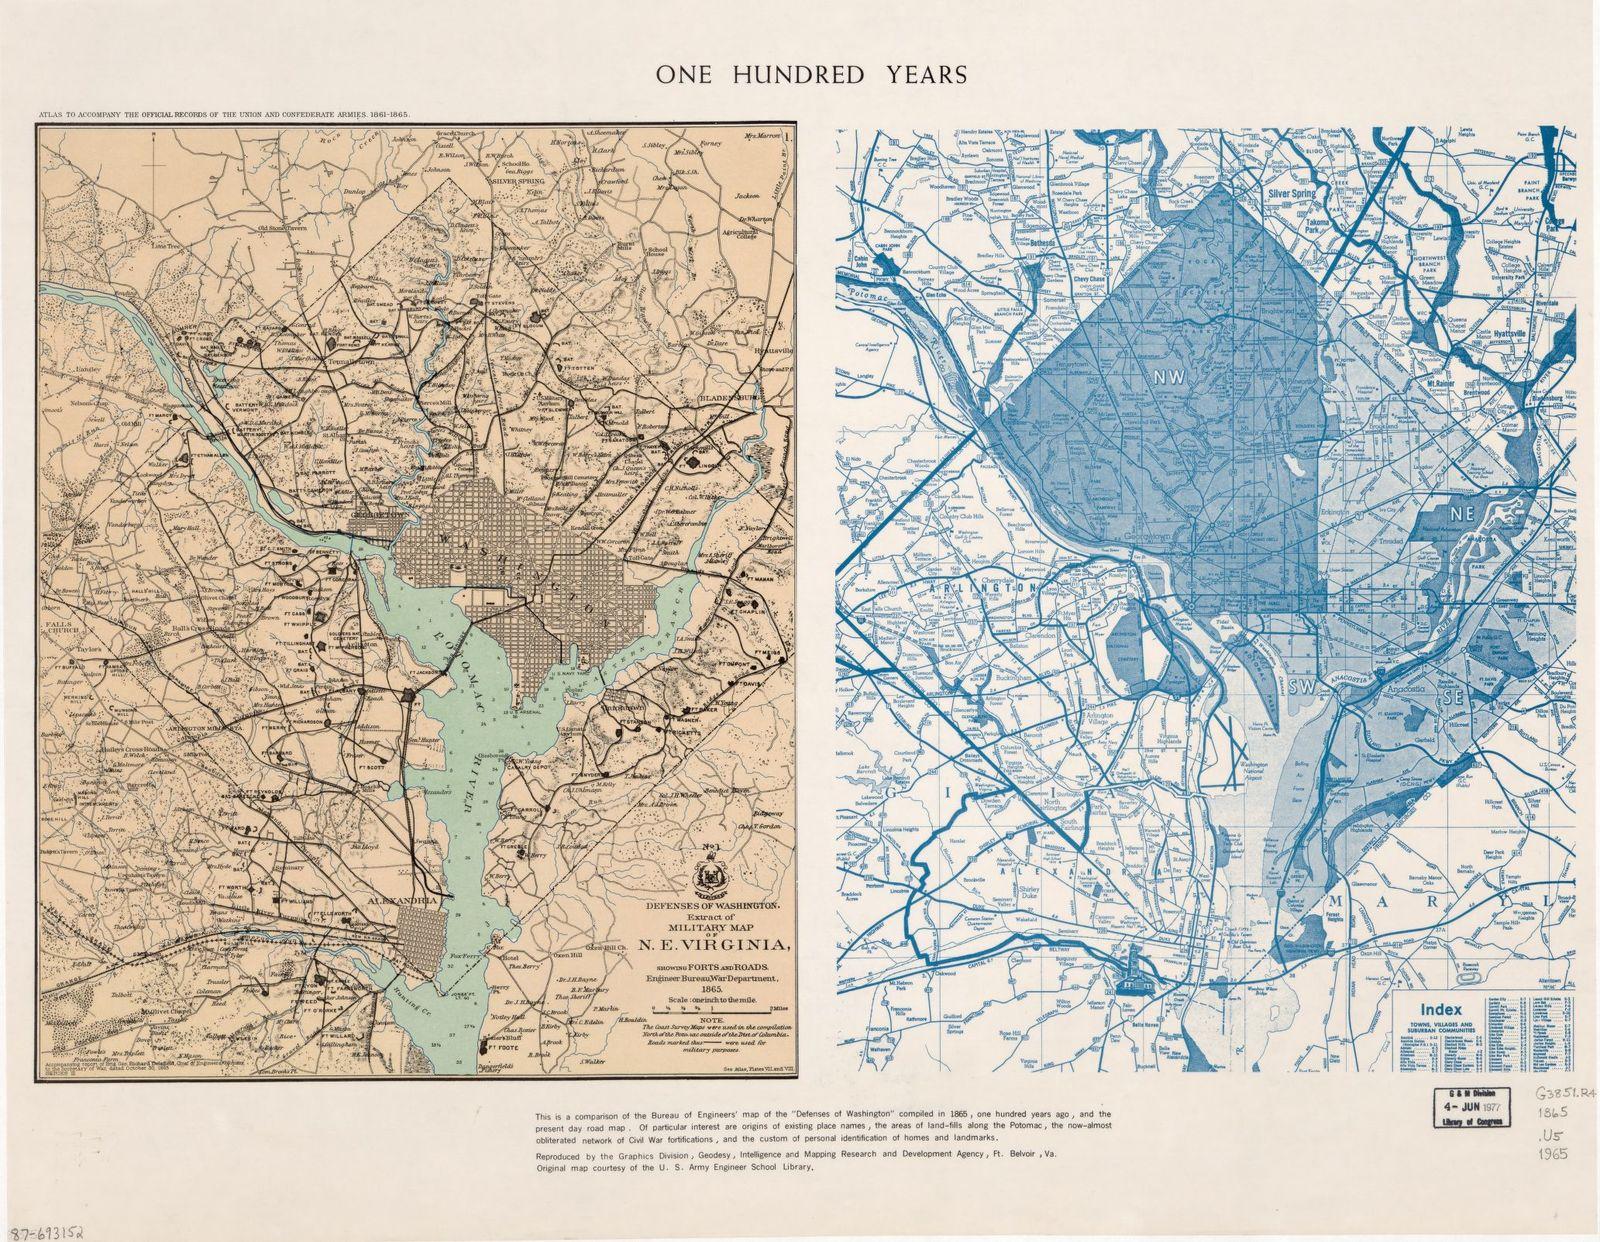 One hundred years : [Washington D.C. and metropolitan area] /